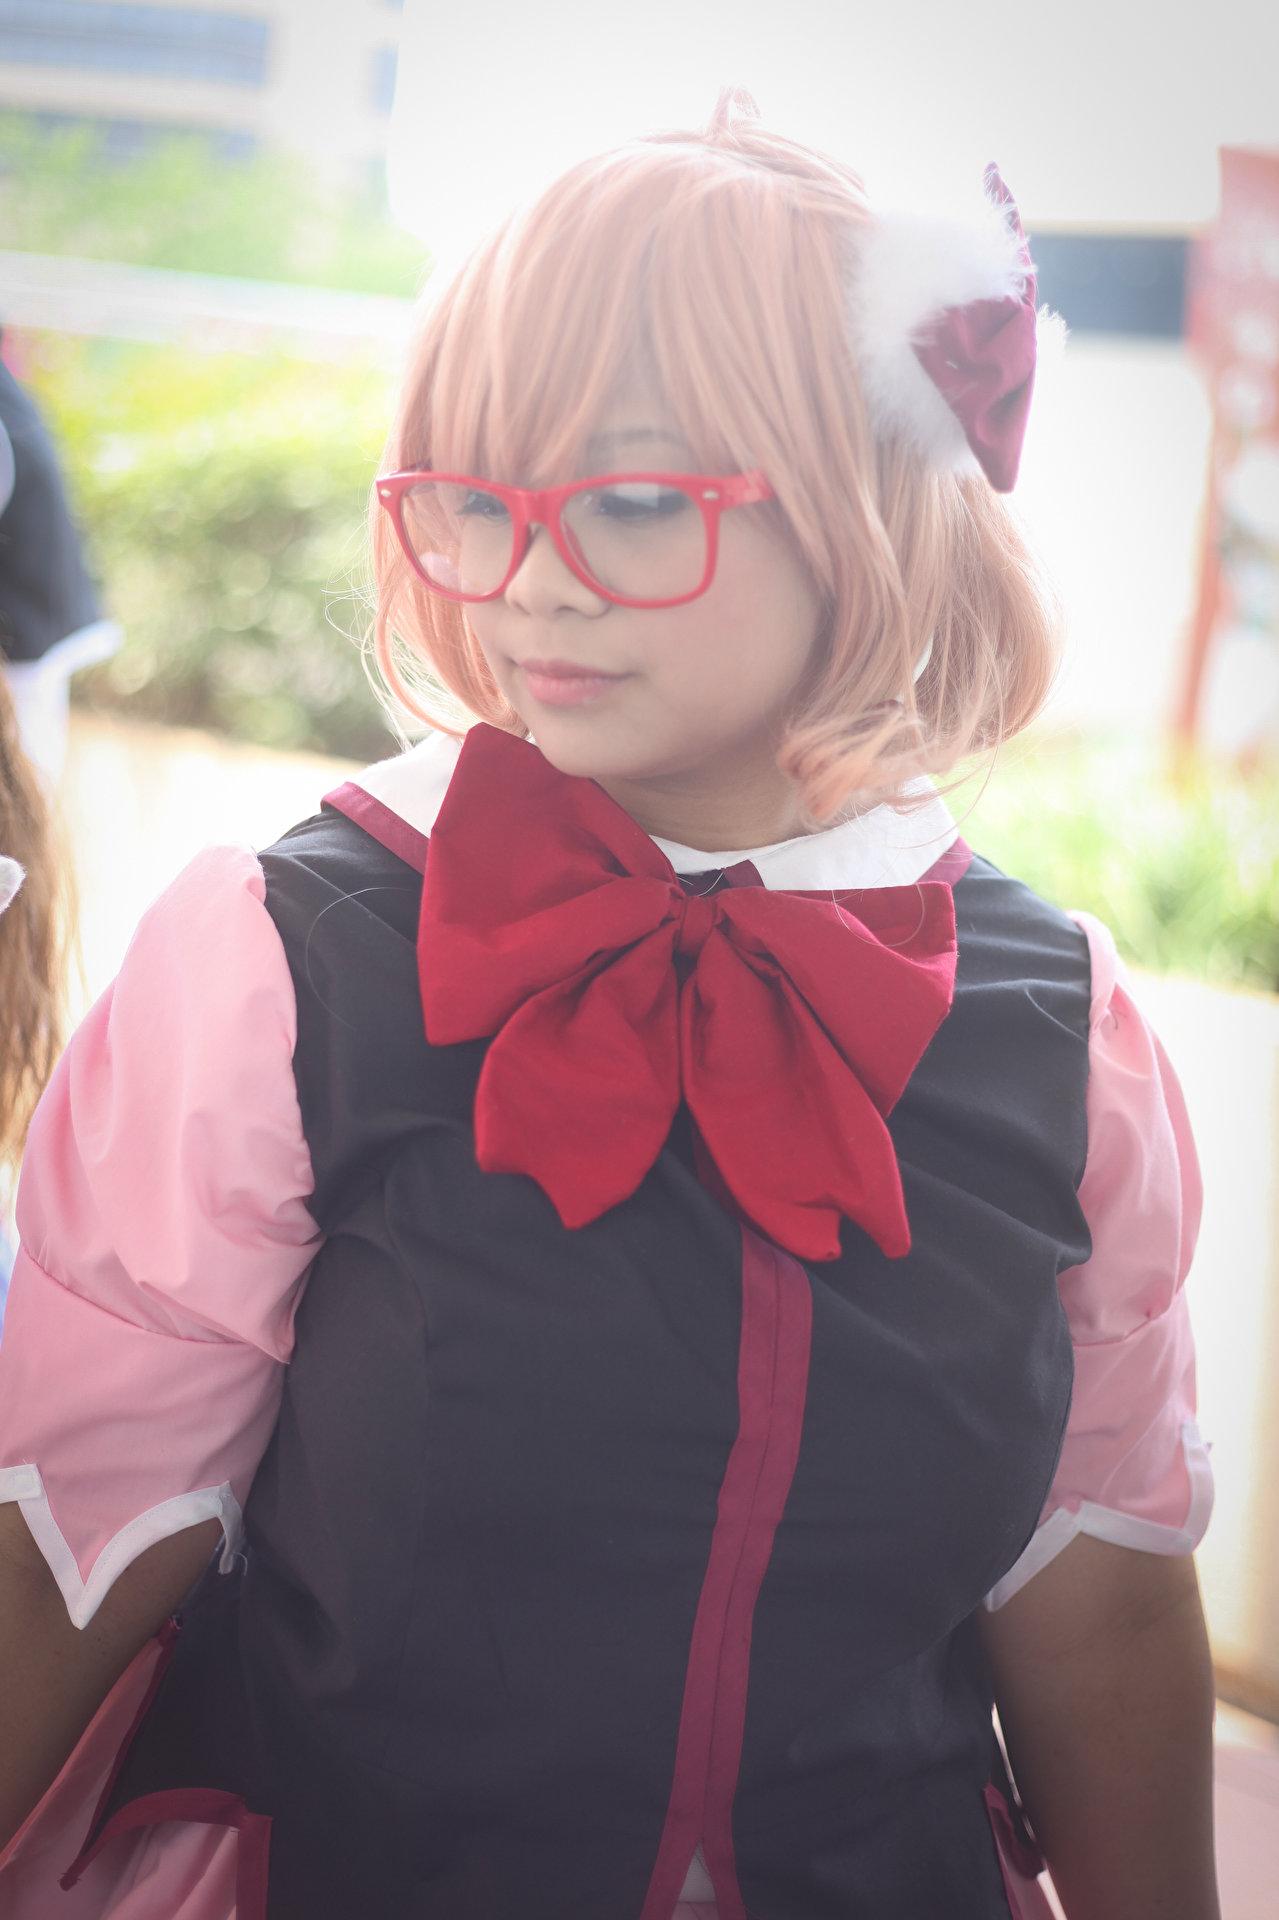 Mirai Kuriyama (Kyoukai no Kanata) photo: Nance M.